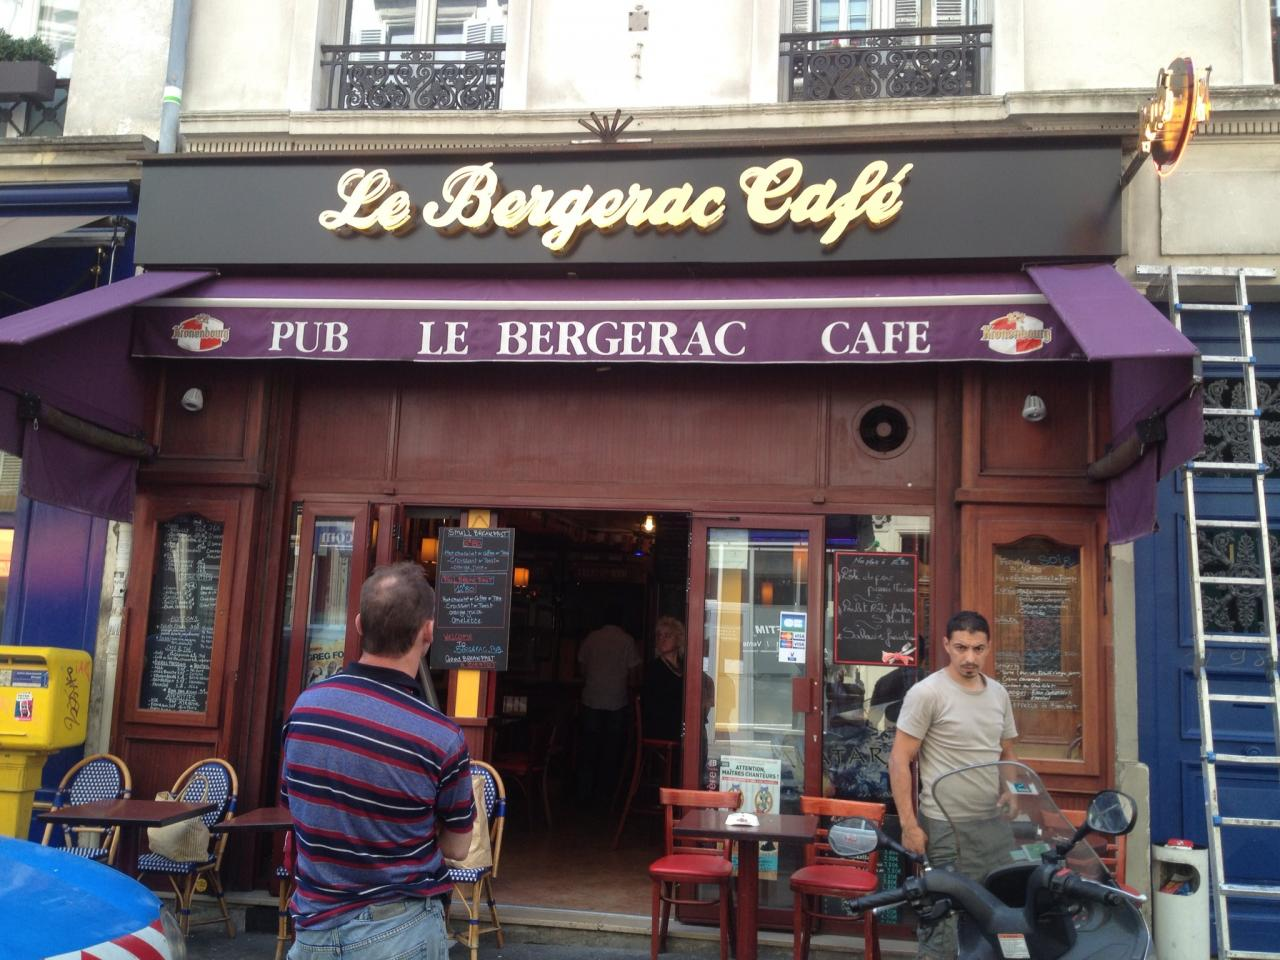 LE BERGERAC CAFE